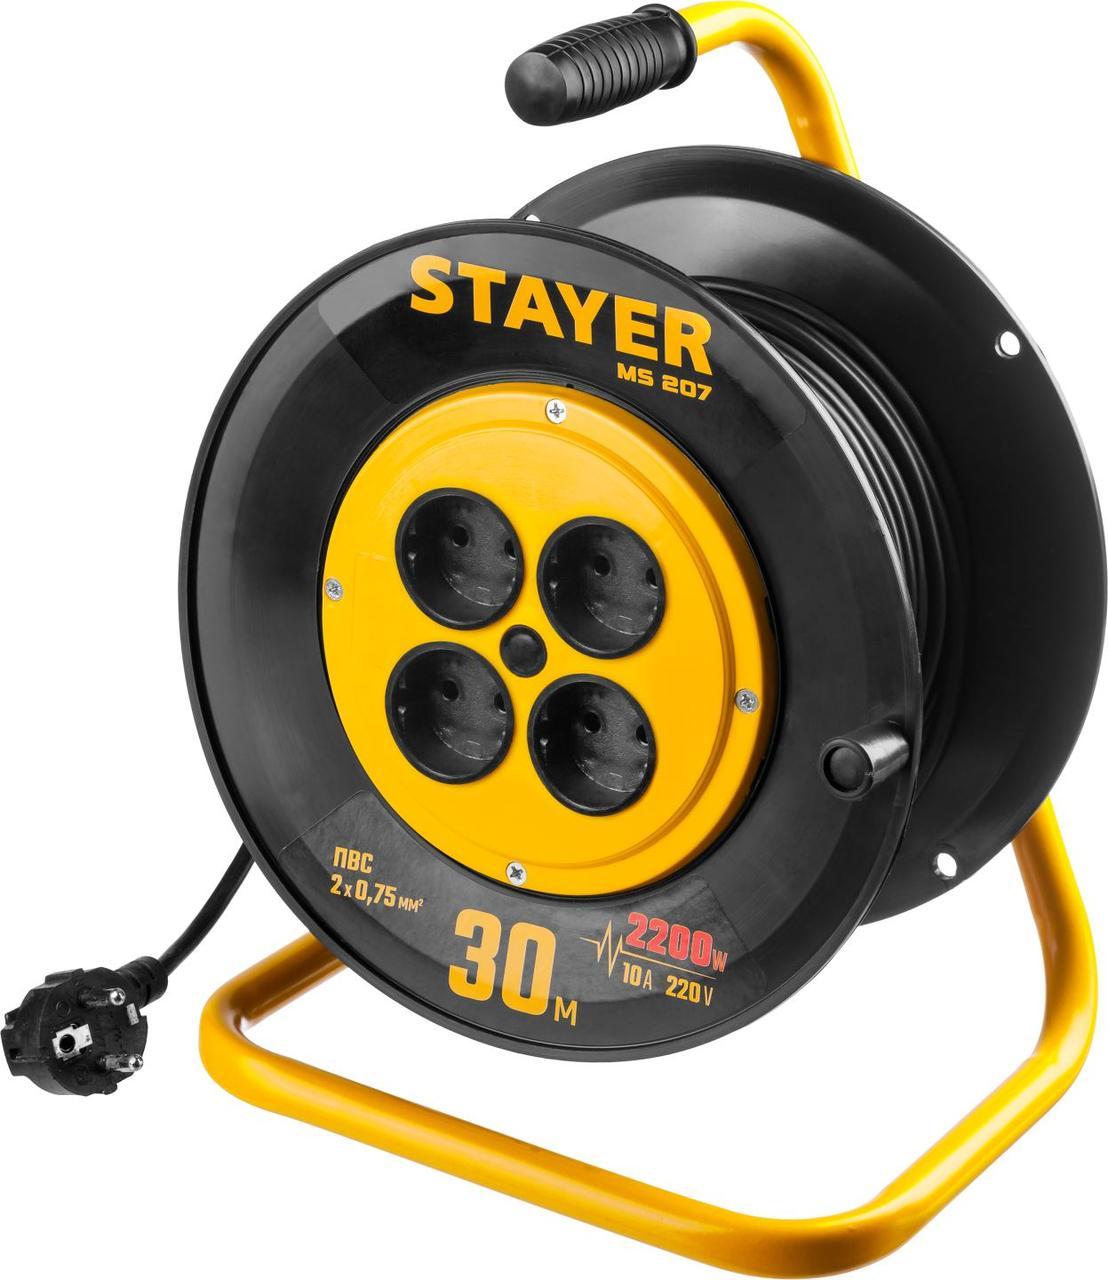 Удлинитель на катушке Stayer, MS 207, 20 м, 2200 Вт, ПВС 2x0,75 (55073-30_z01)